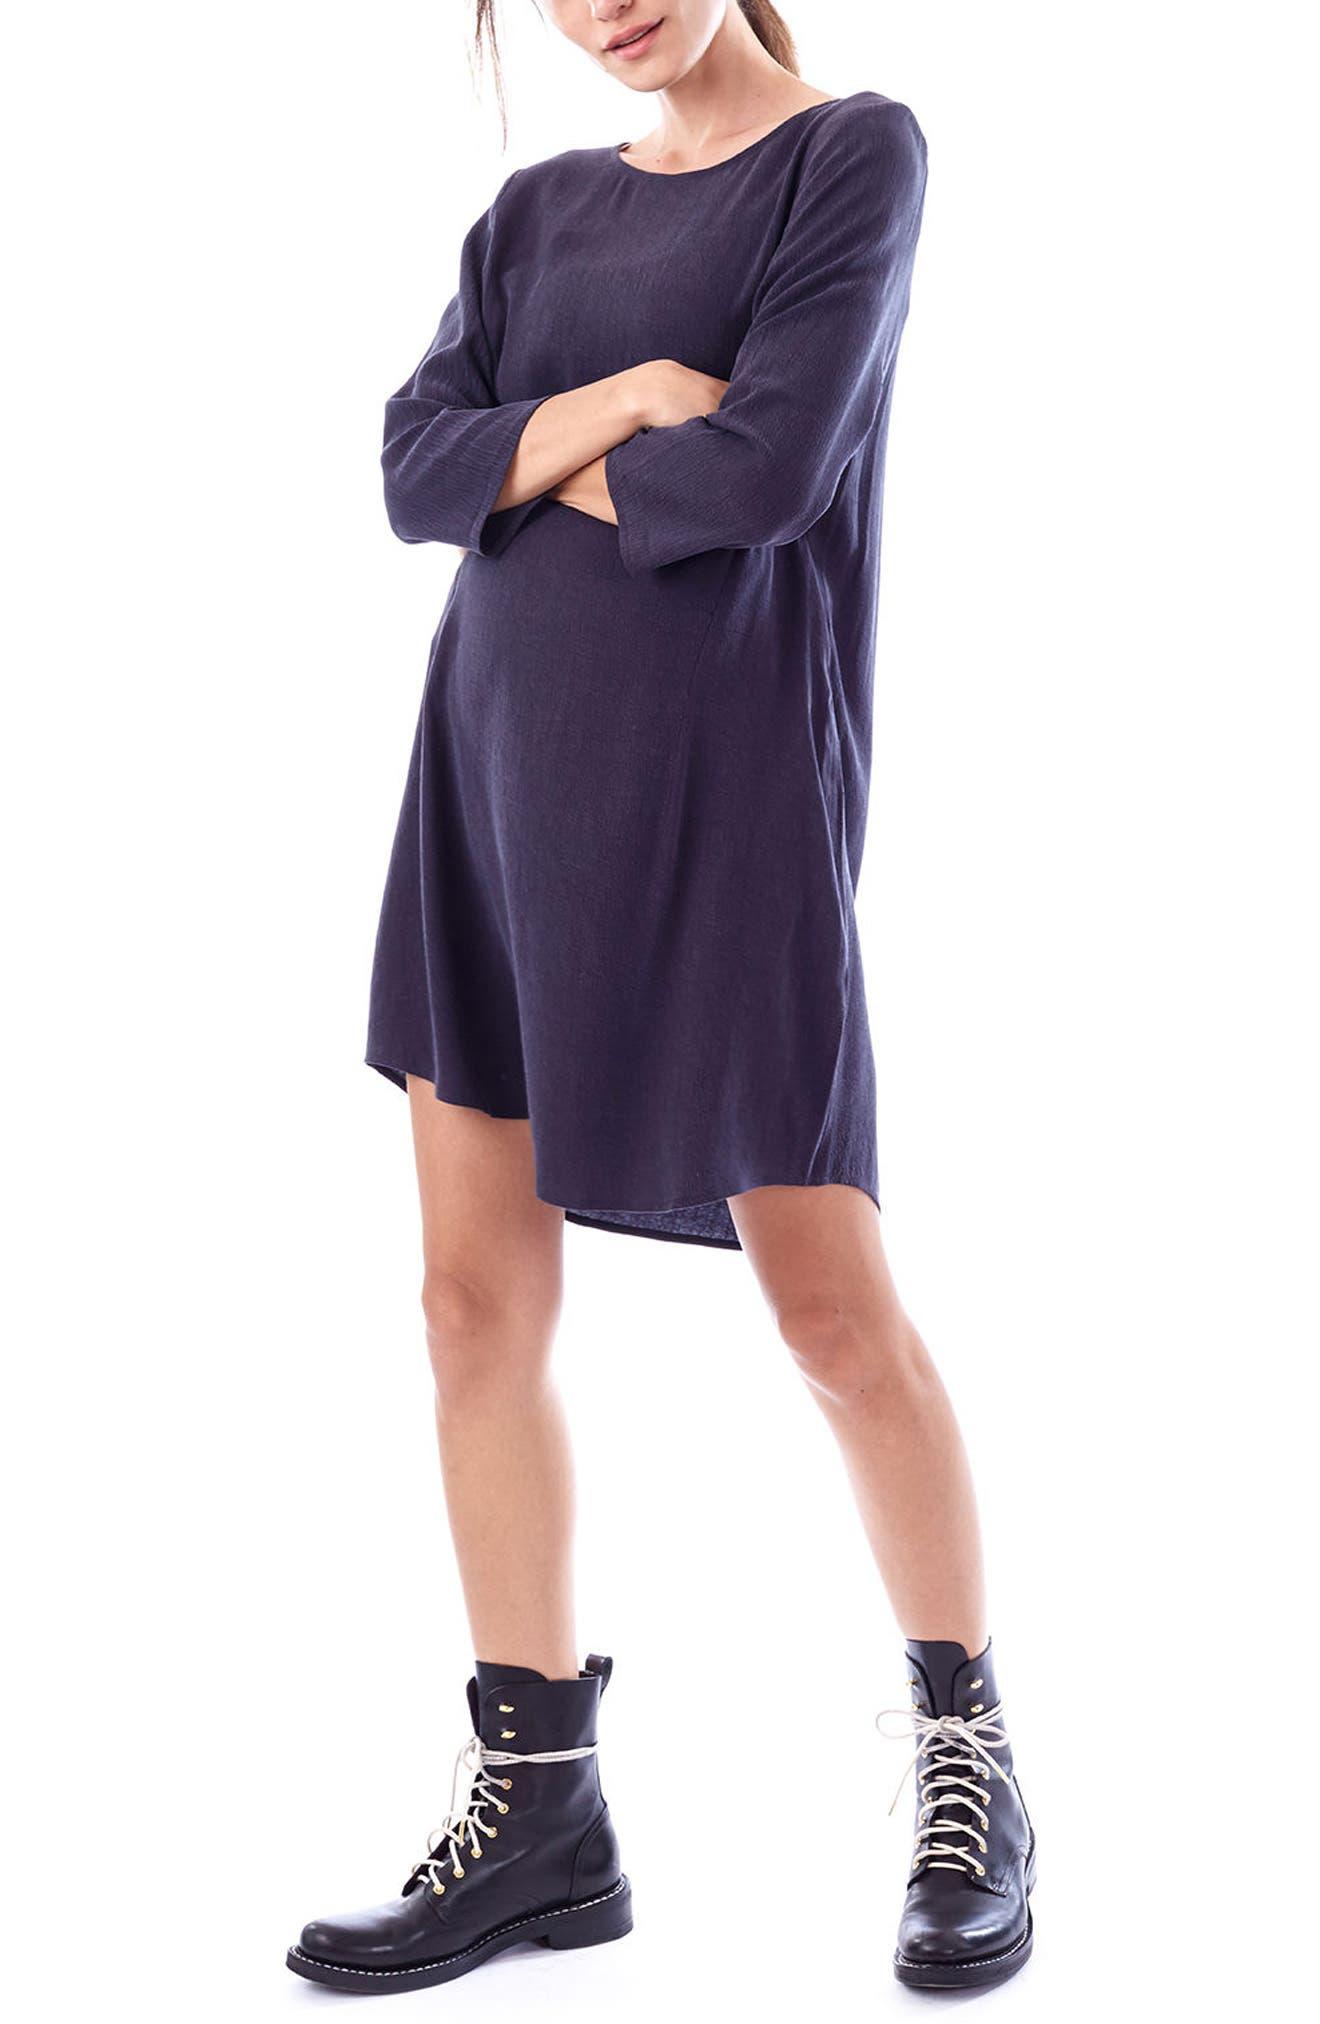 Loyal Hana Layla Maternity/nursing Dress, Black